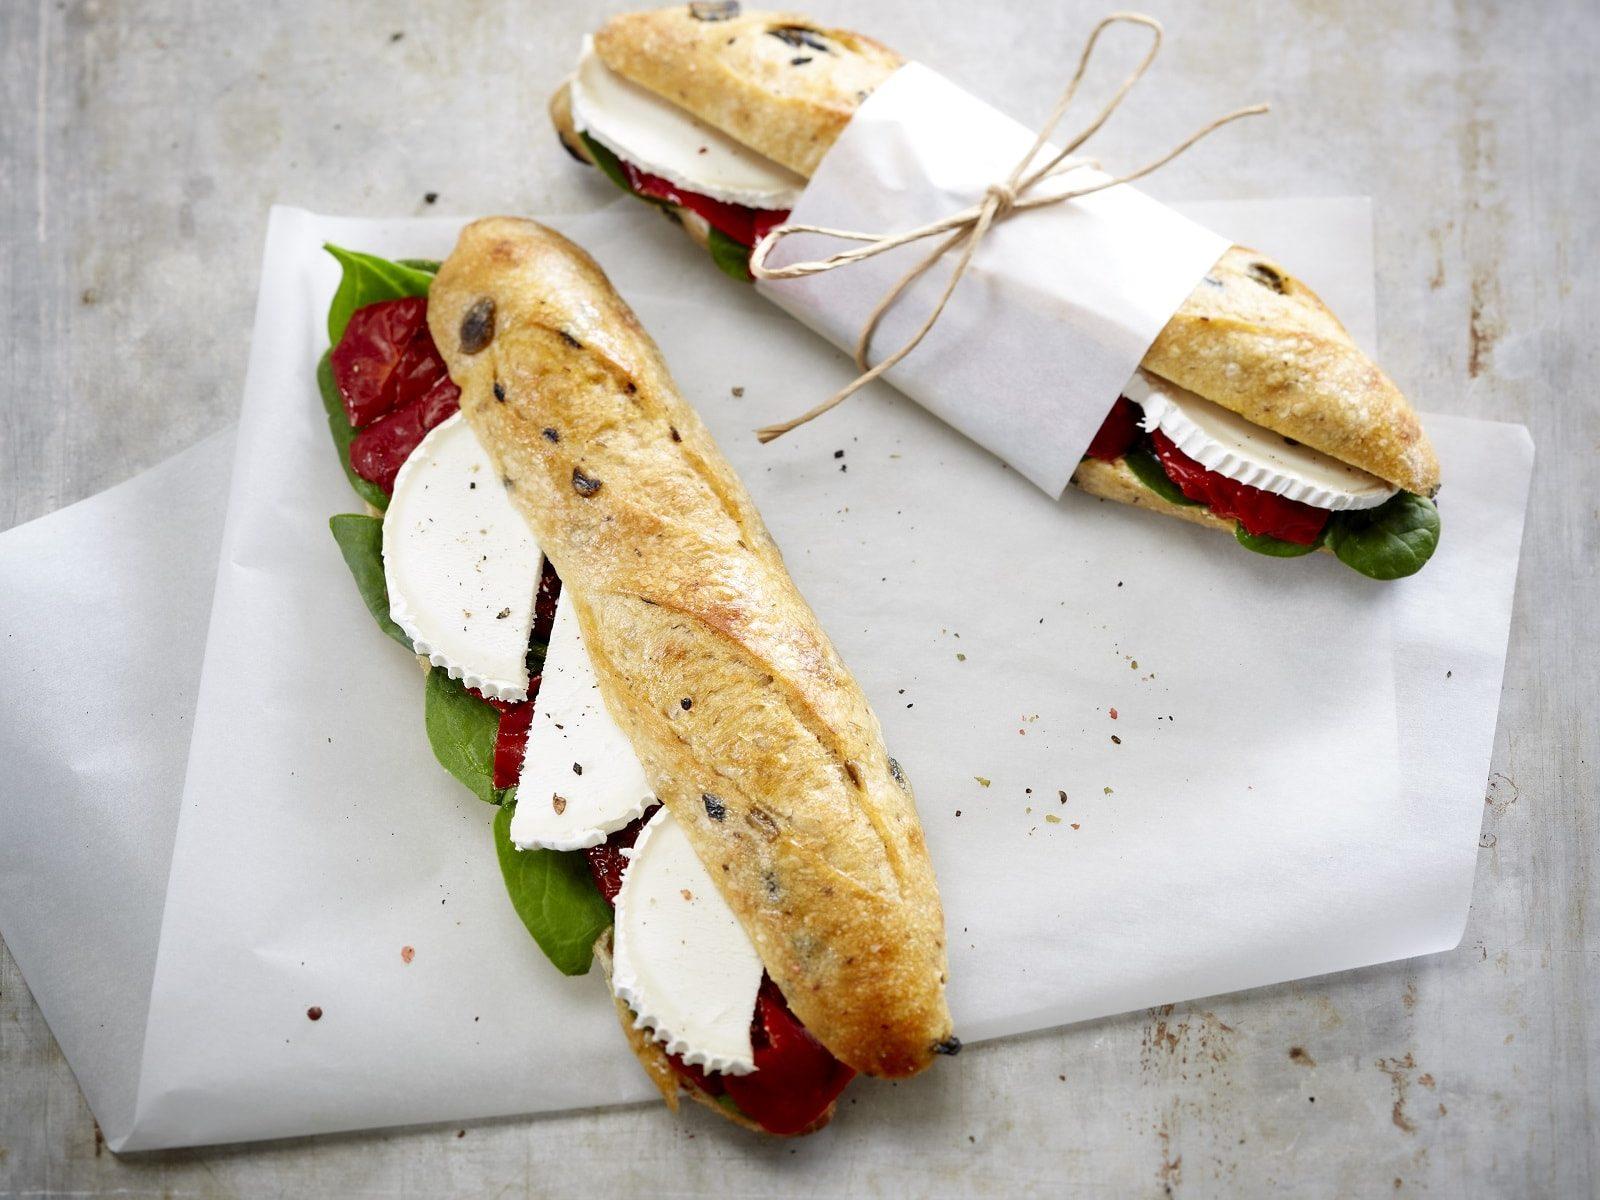 Sandwich baie des anges boulangerie kayser